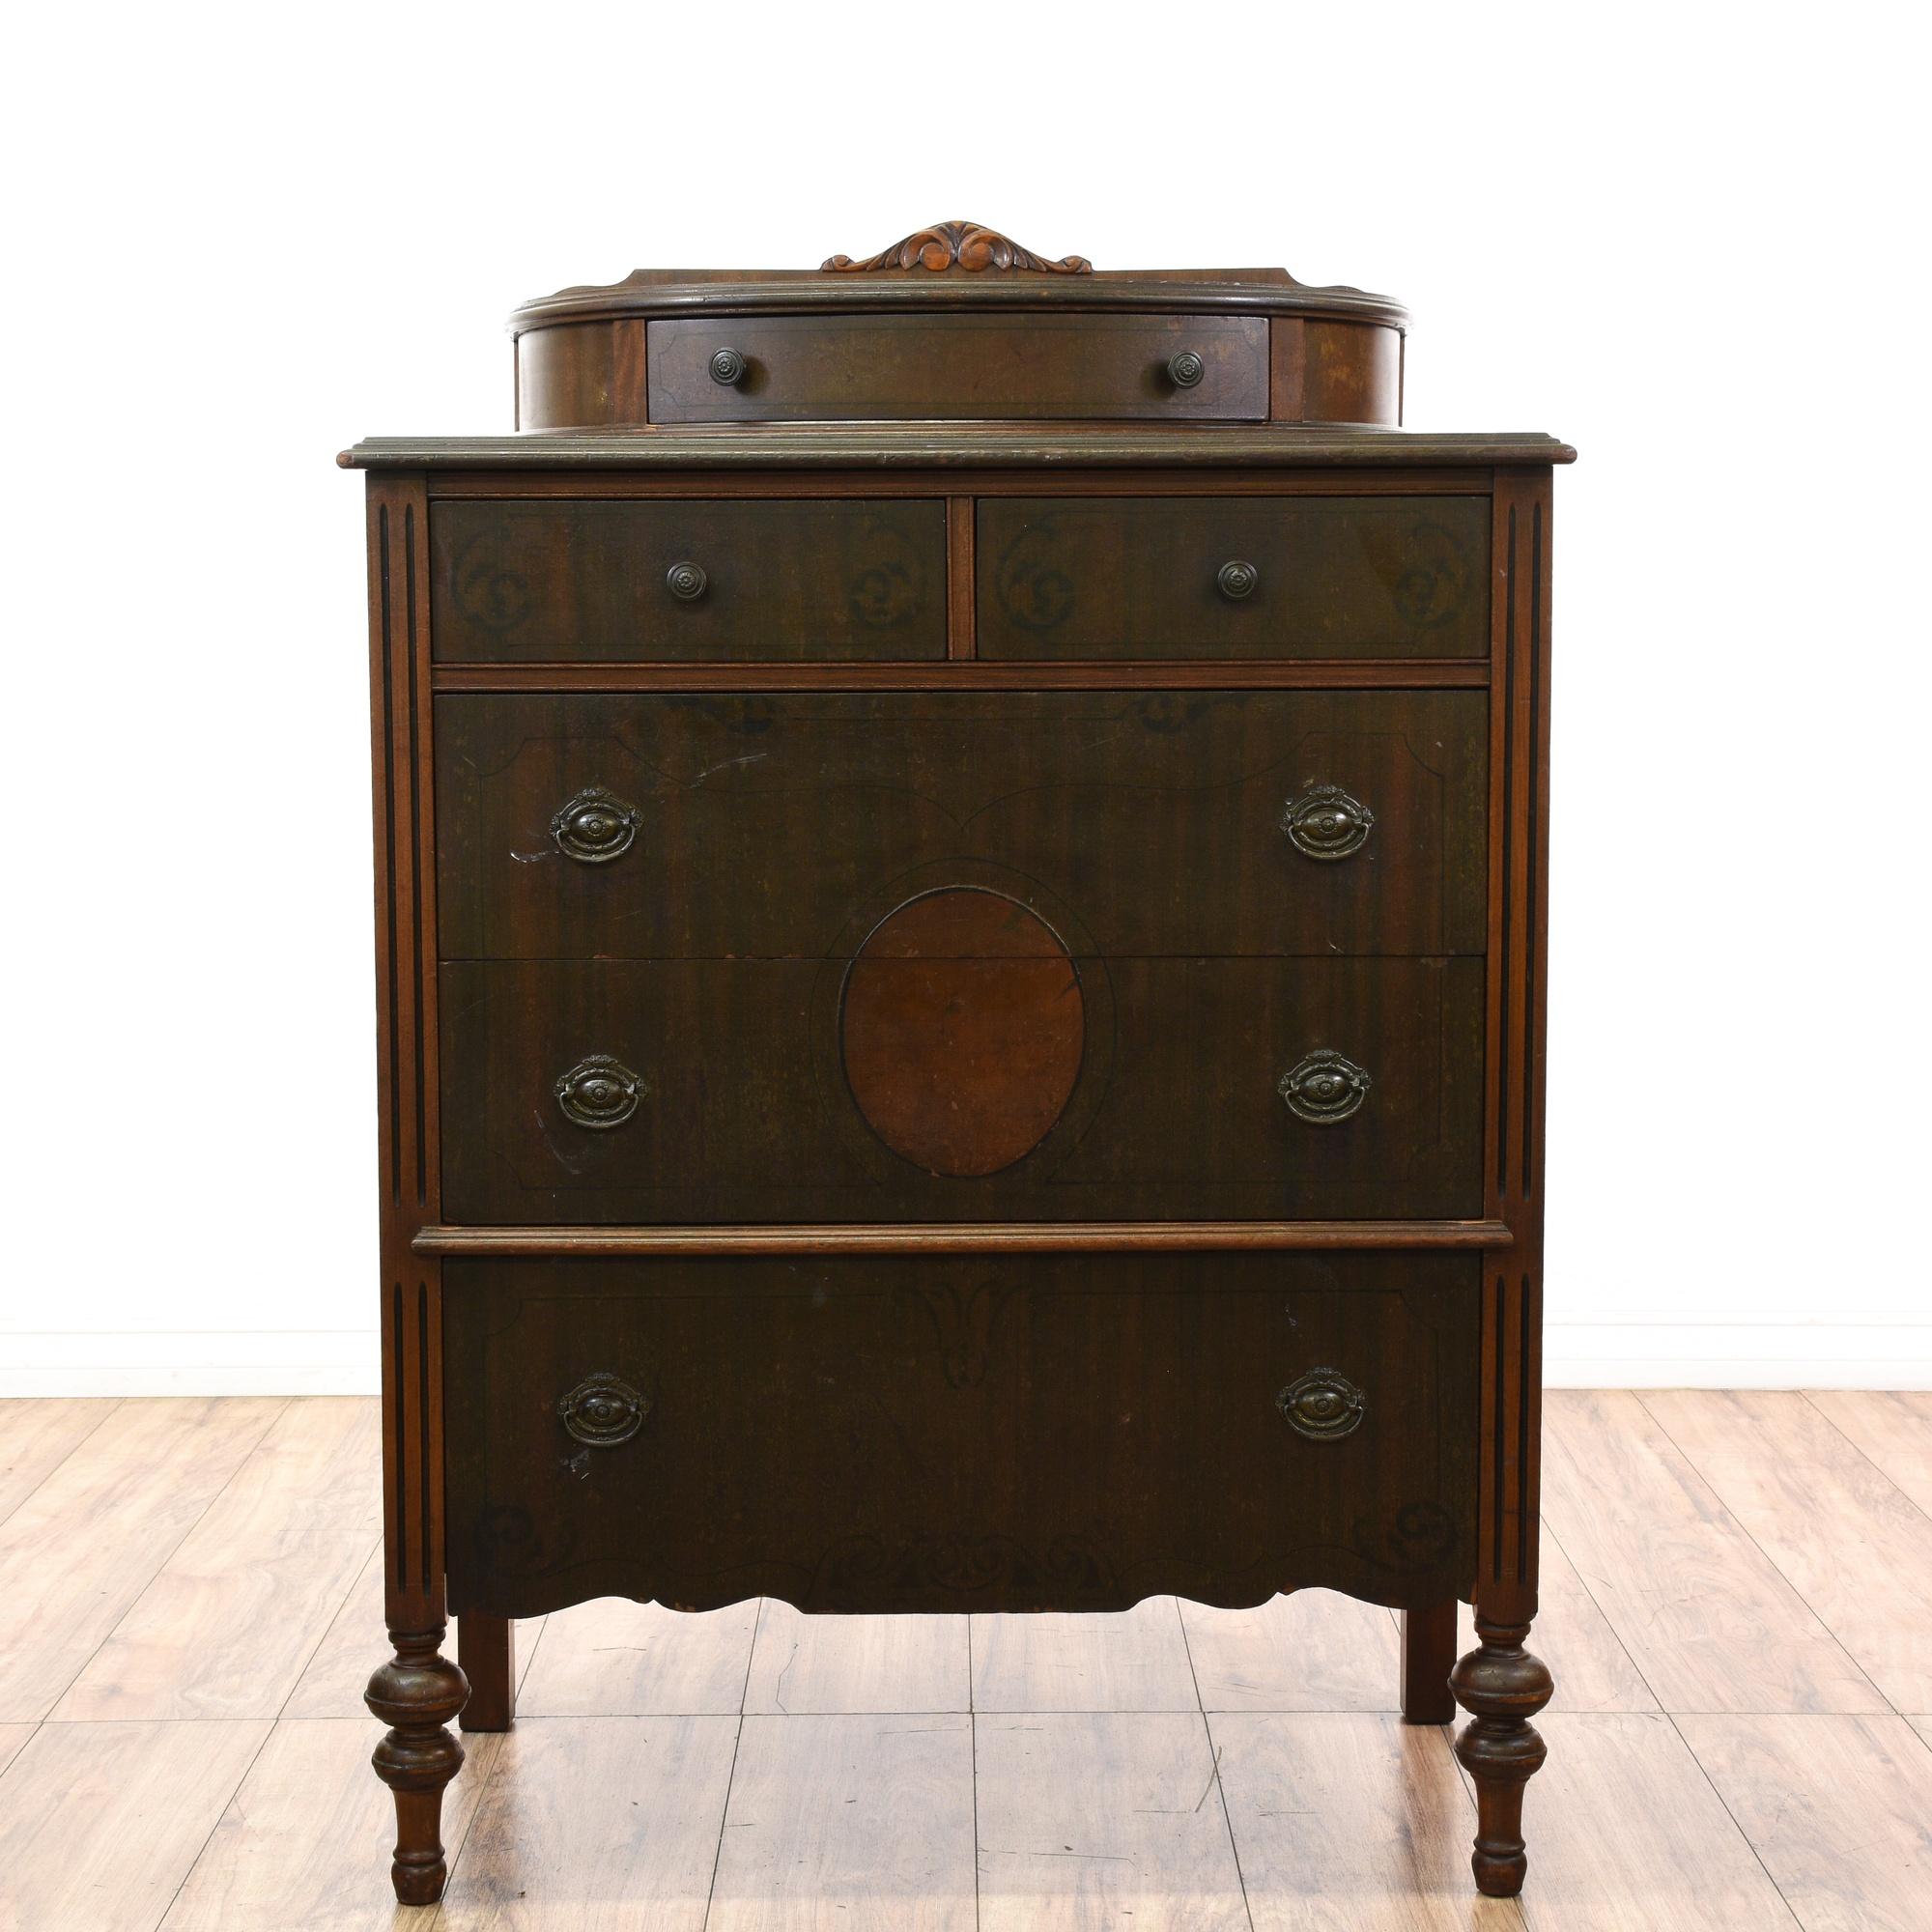 1930s Dresser Bestdressers 2019